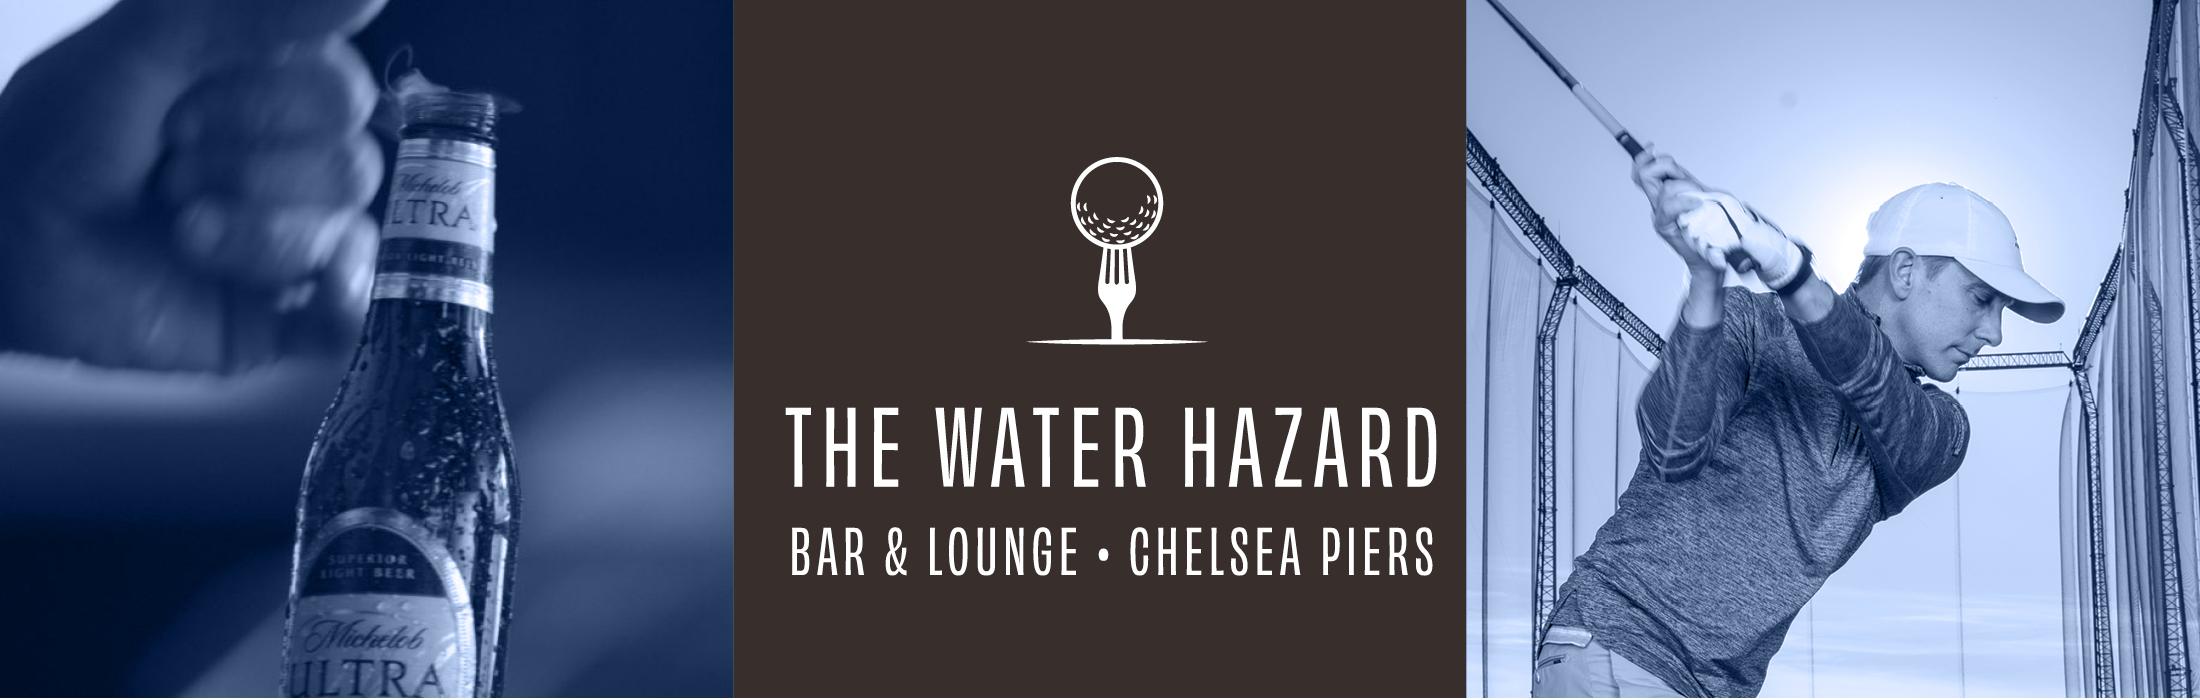 The Water Hazard Bar & Lounge